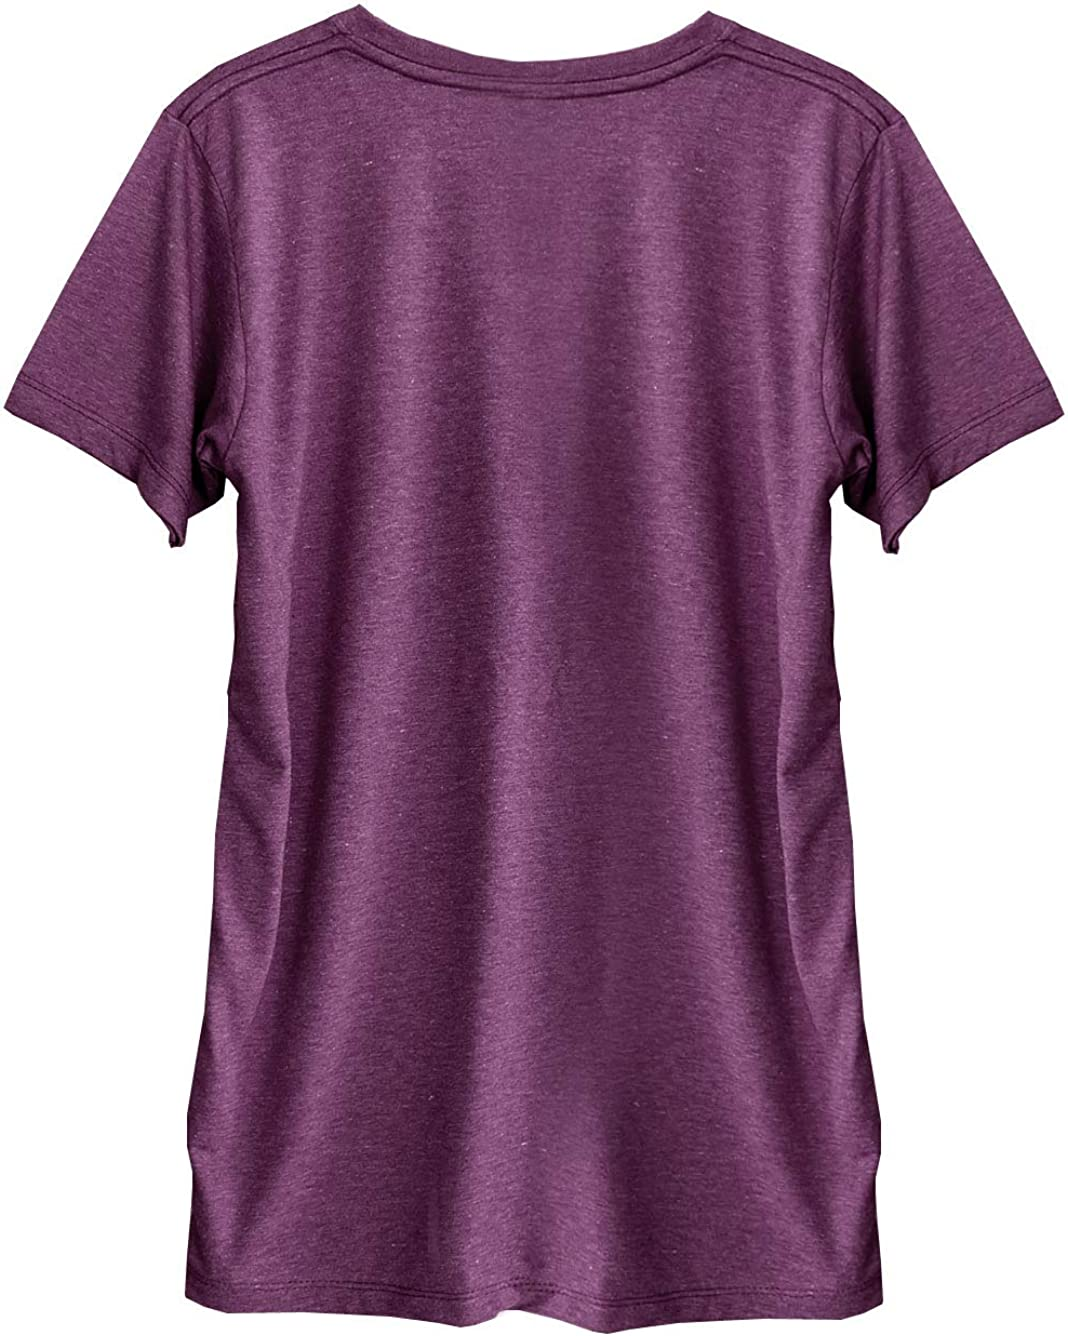 TeeMixed Women Unisex tri-Blend V-Neck Short Sleeve t-Shirt with Funny Print 9307